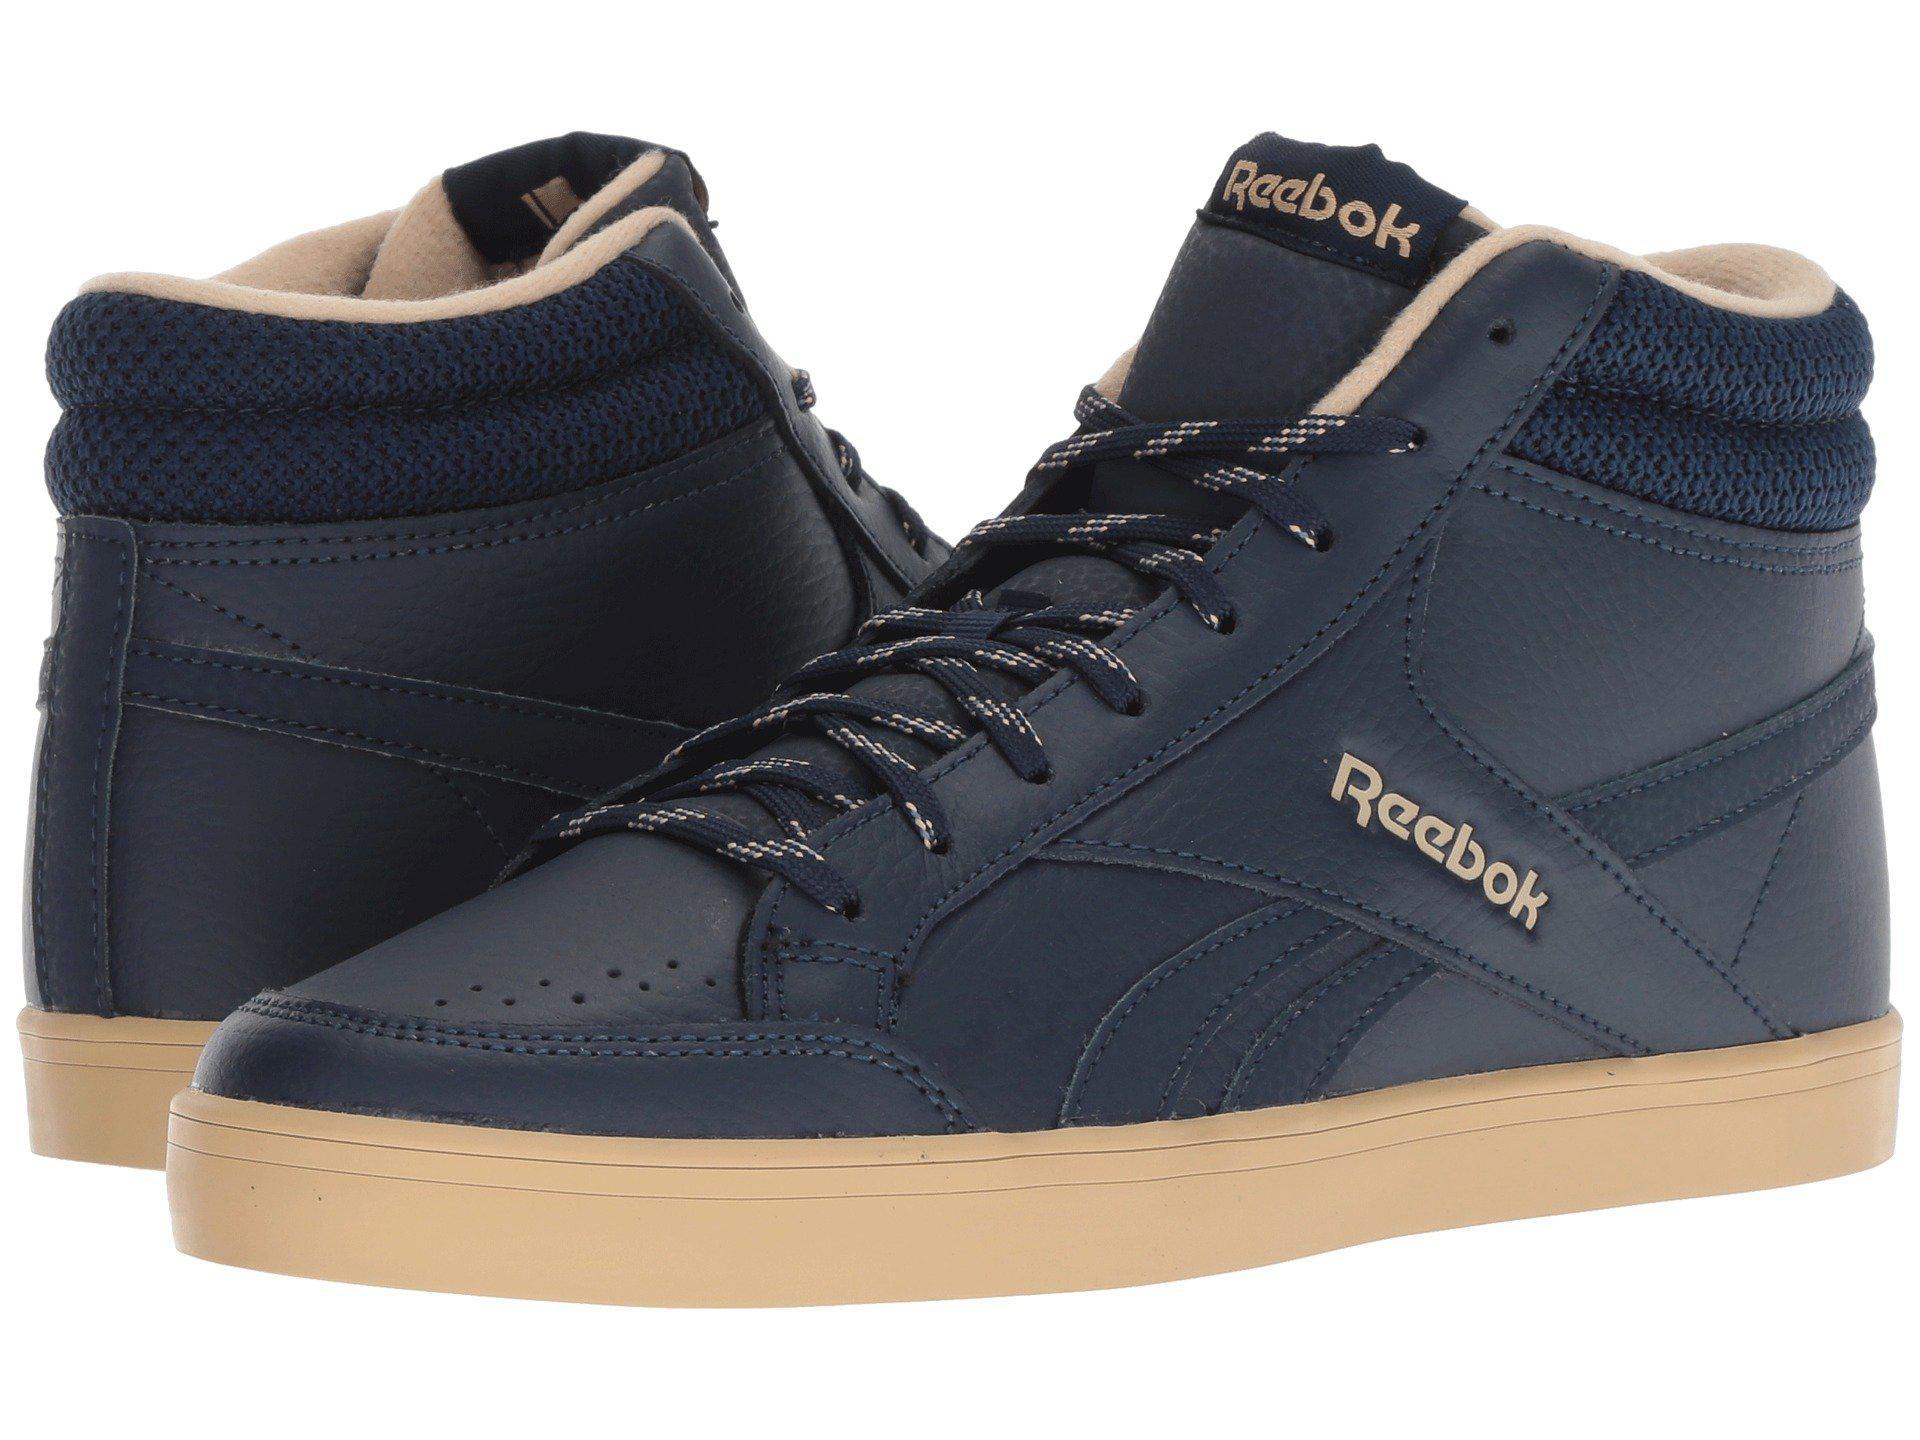 33026795c17 Reebok - Blue Royal Aspire 2 Walking Shoe - Lyst. View fullscreen